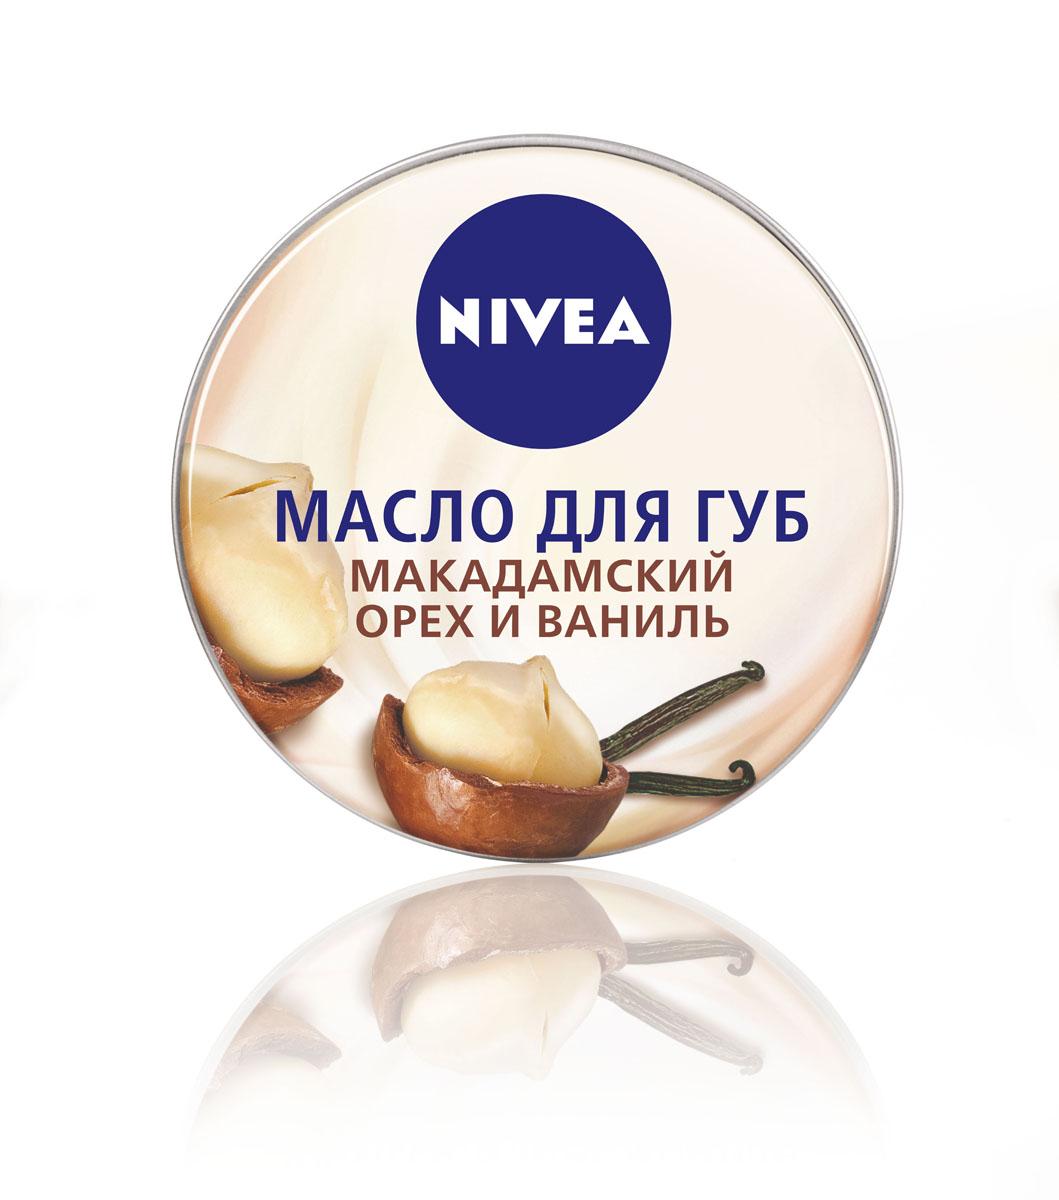 NIVEA Масло для губ «Макадамский орех и ваниль» 19 мл 100620805